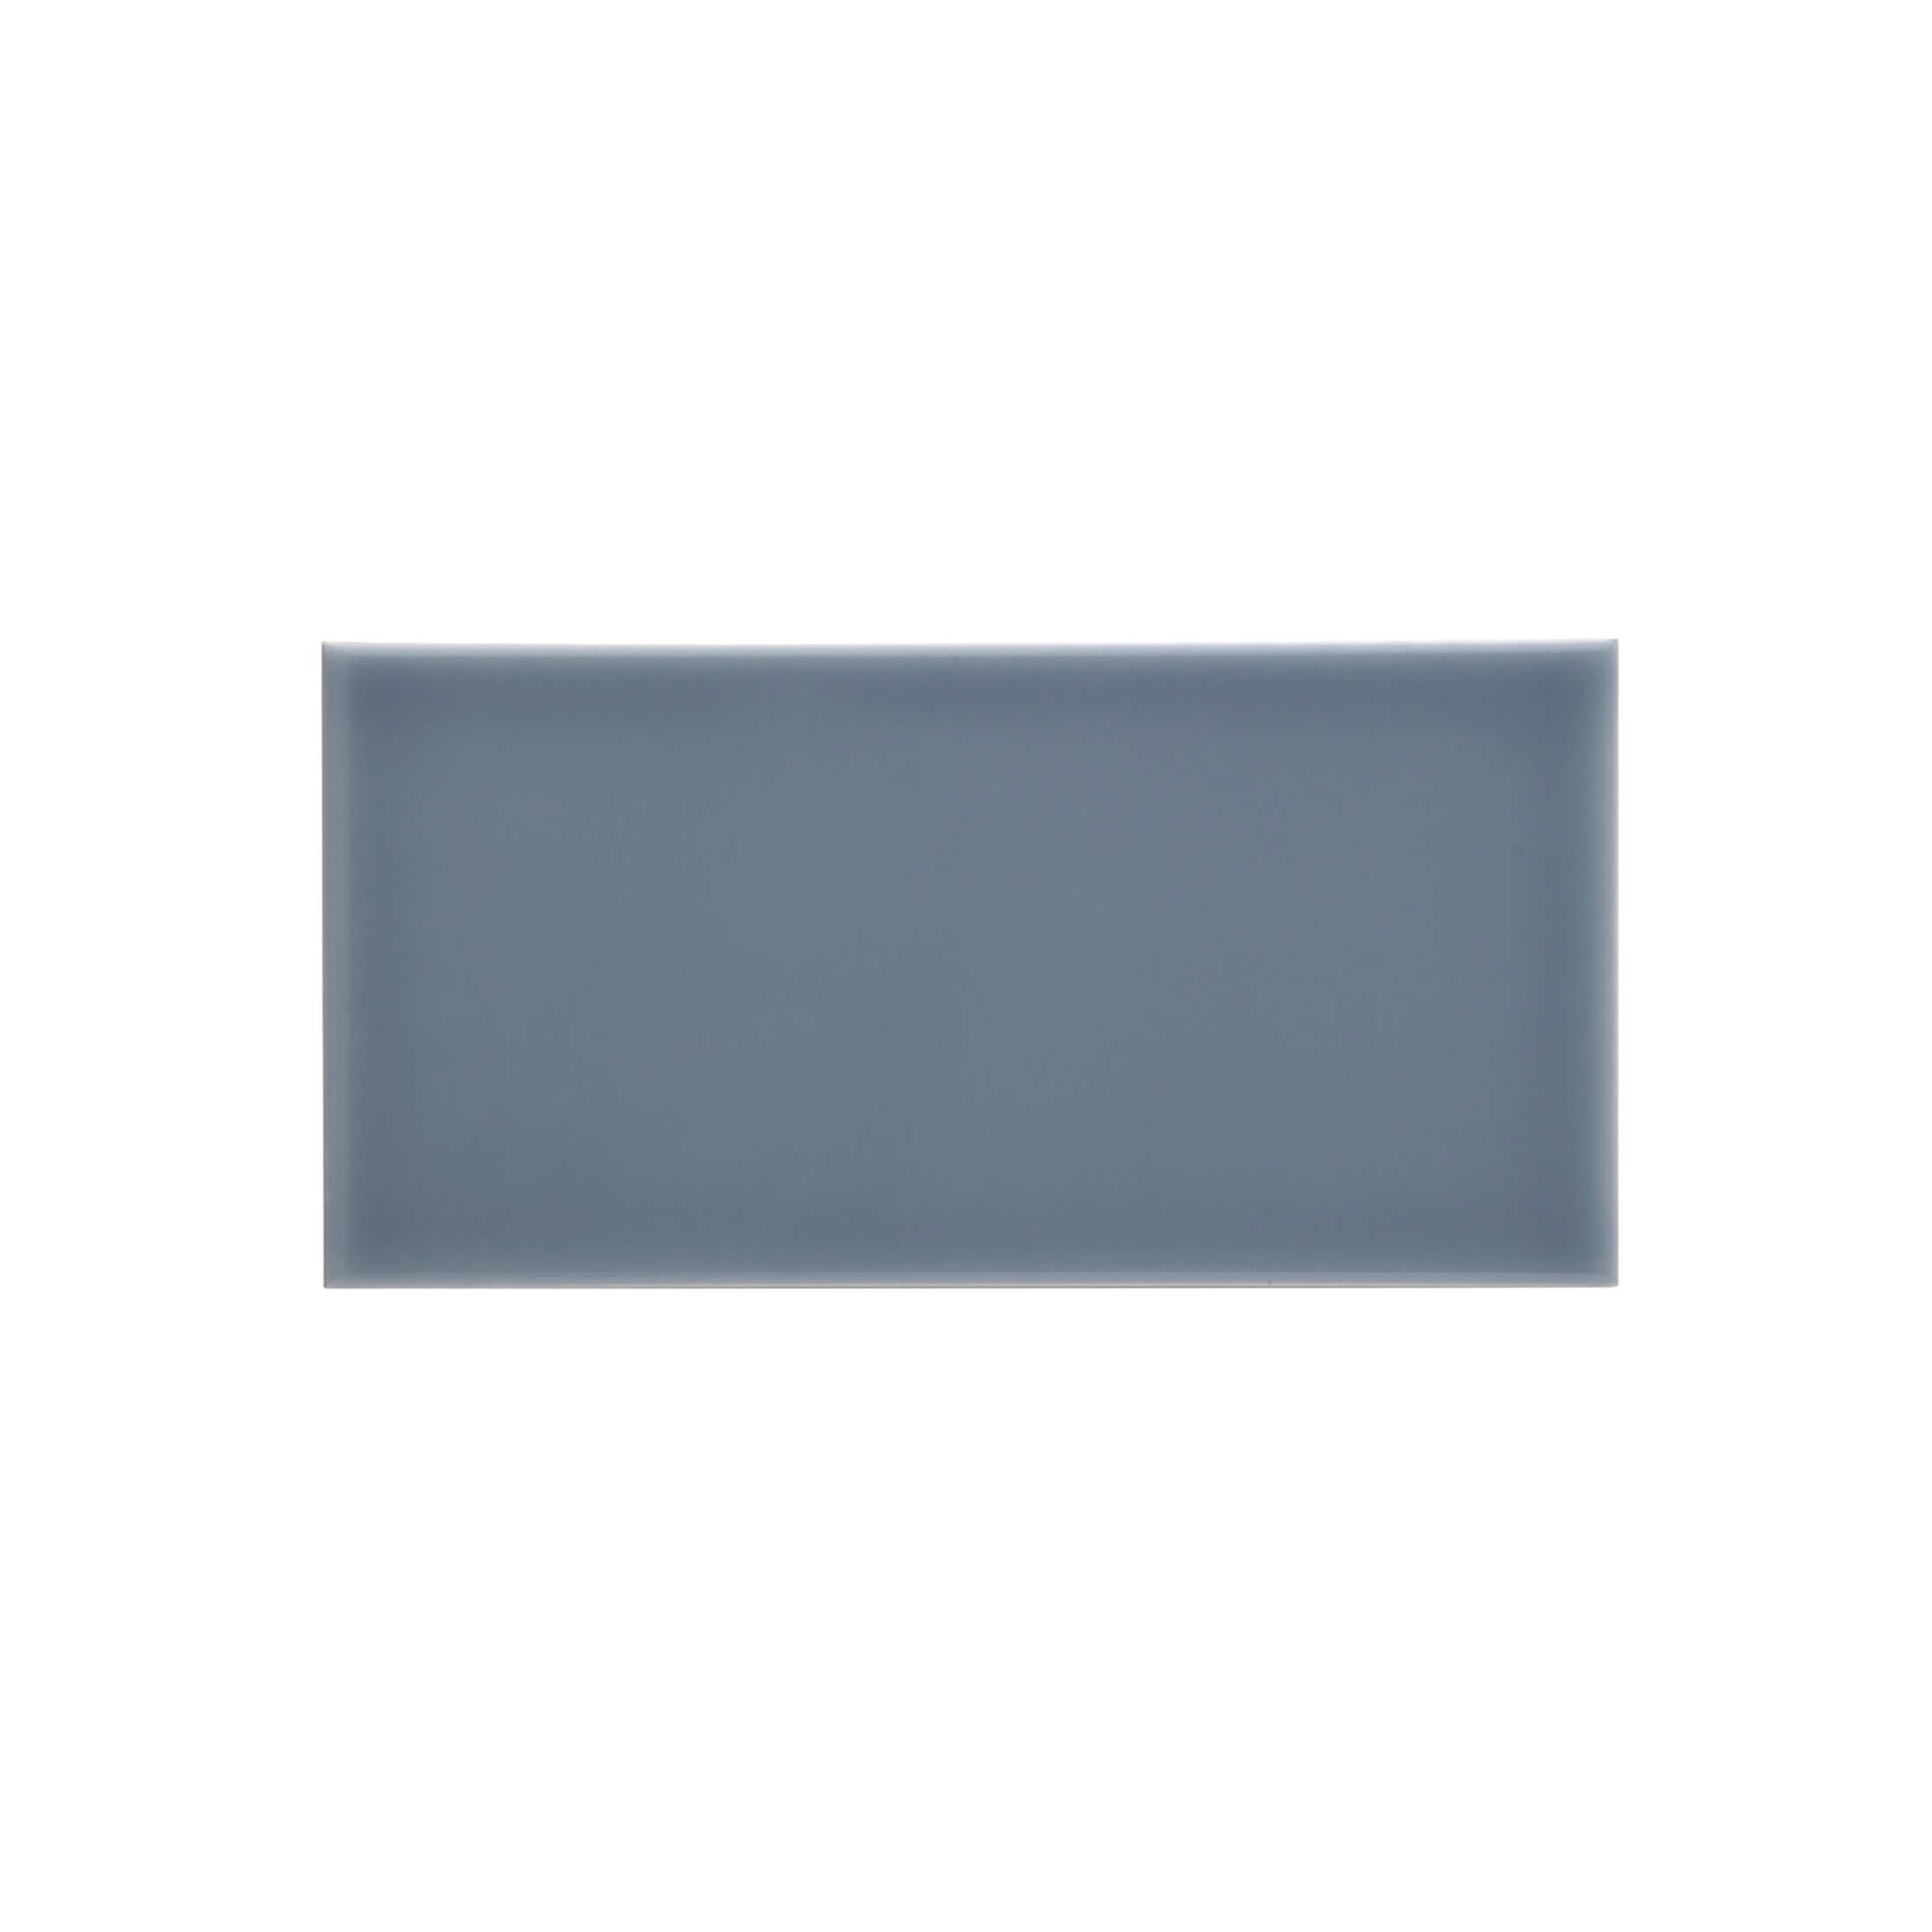 ADNE1098 - LISO PB - 10 cm X 20 cm